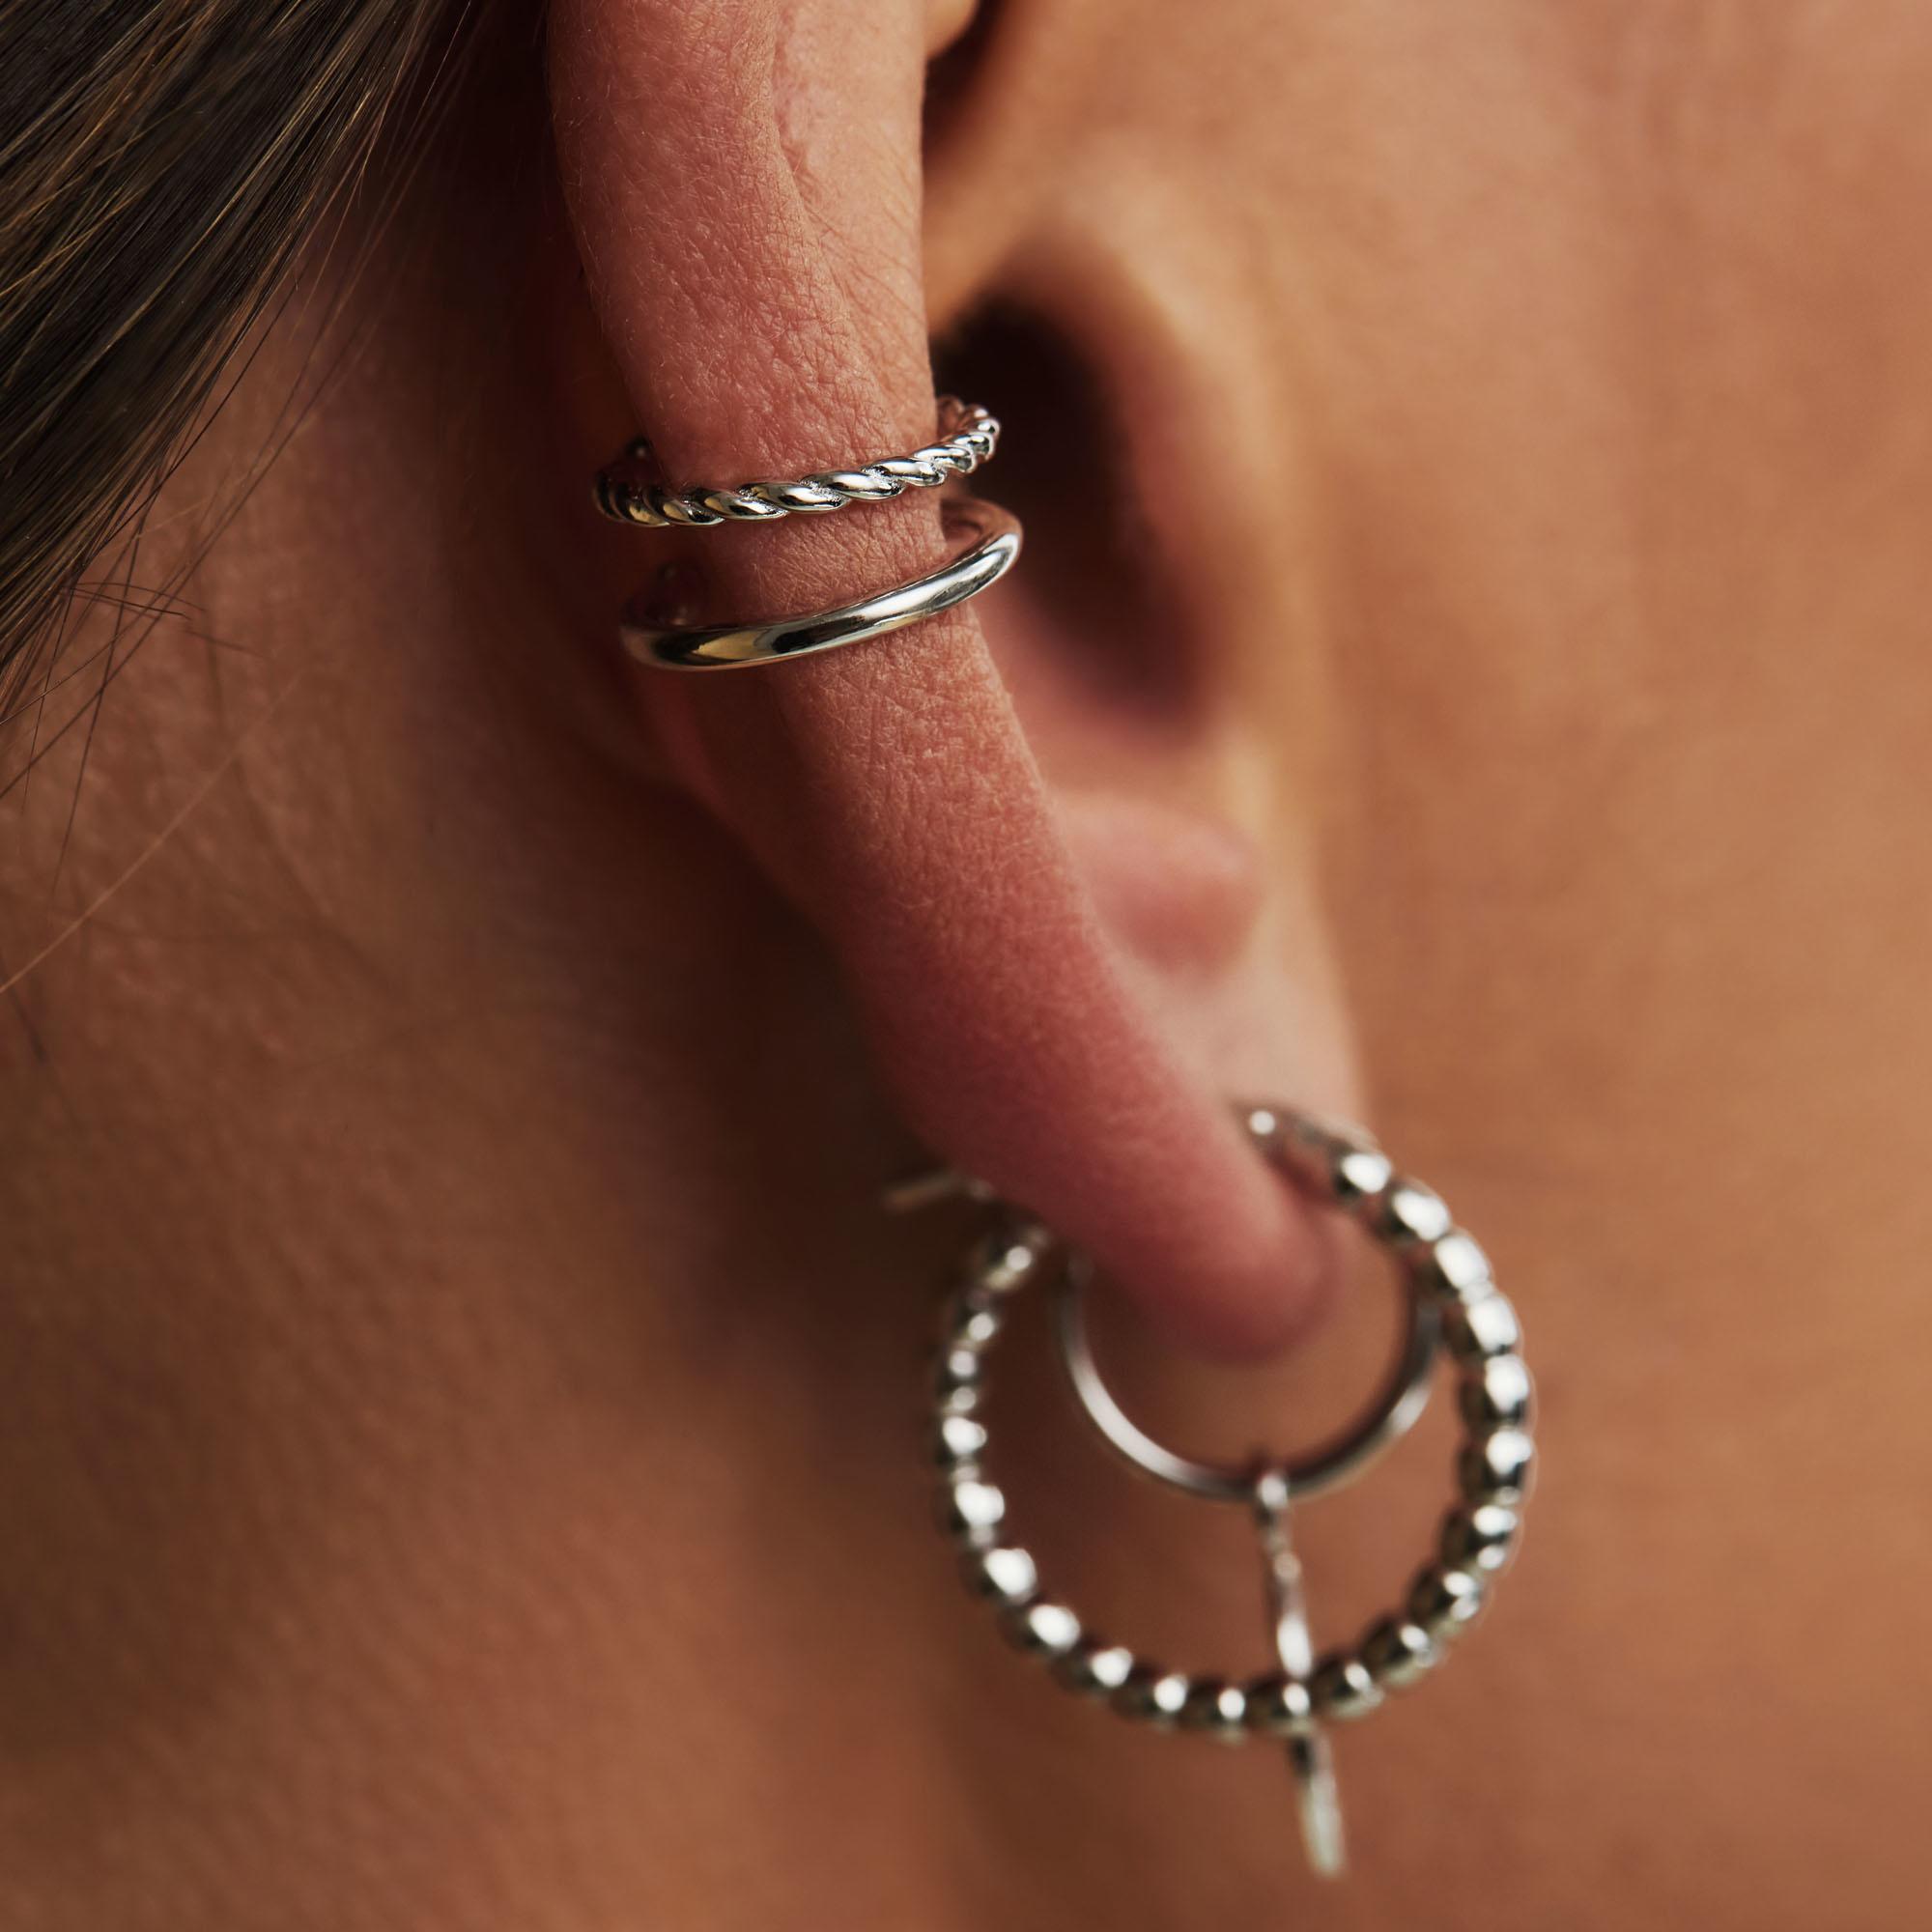 Selected Jewels Léna Joy ear cuff i 925 sterling silver